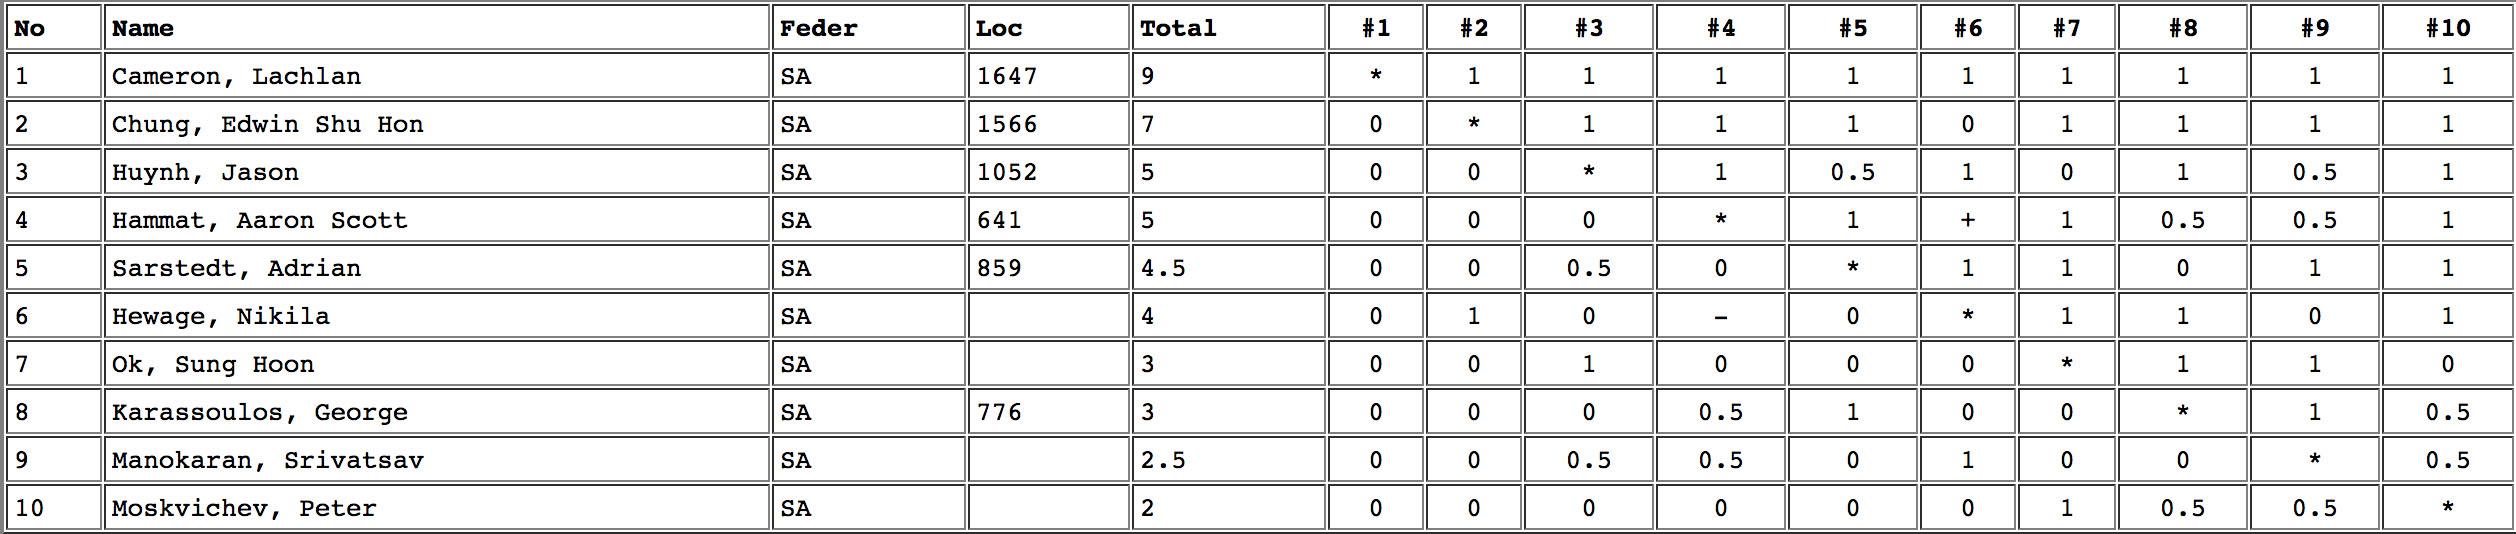 Lidums SA Young Masters 2012 Results